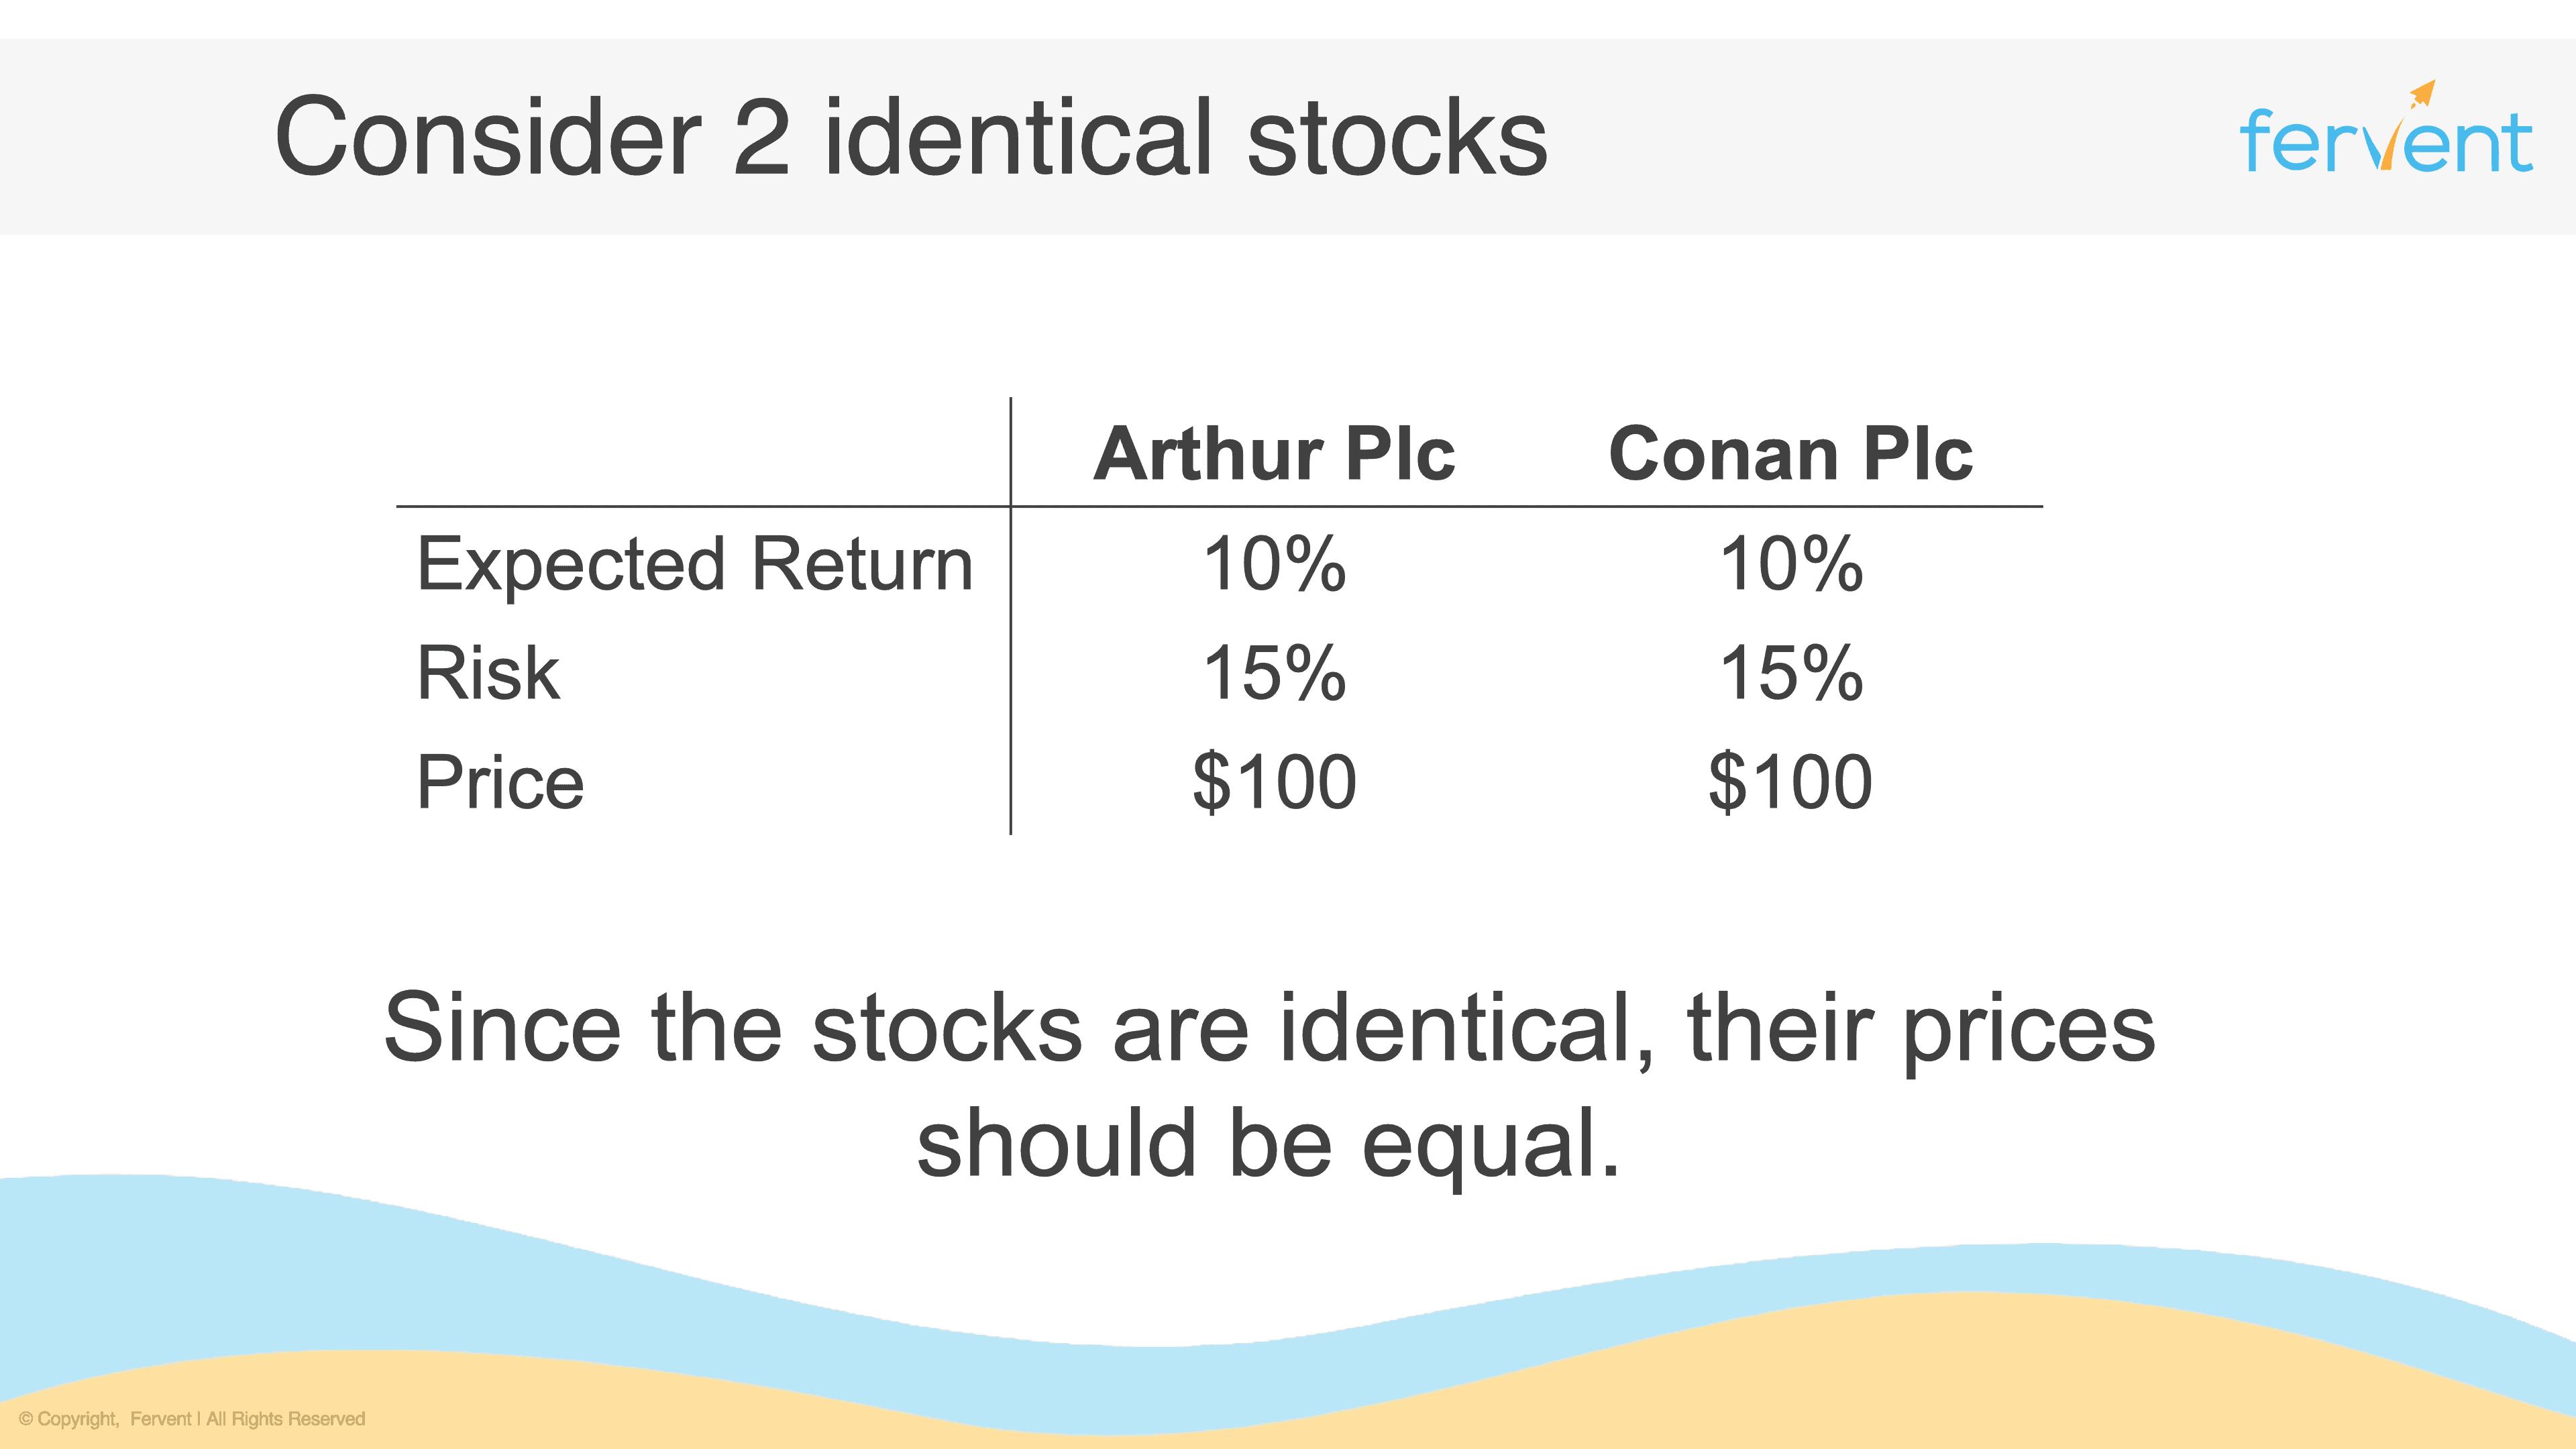 Slide displaying identical prices